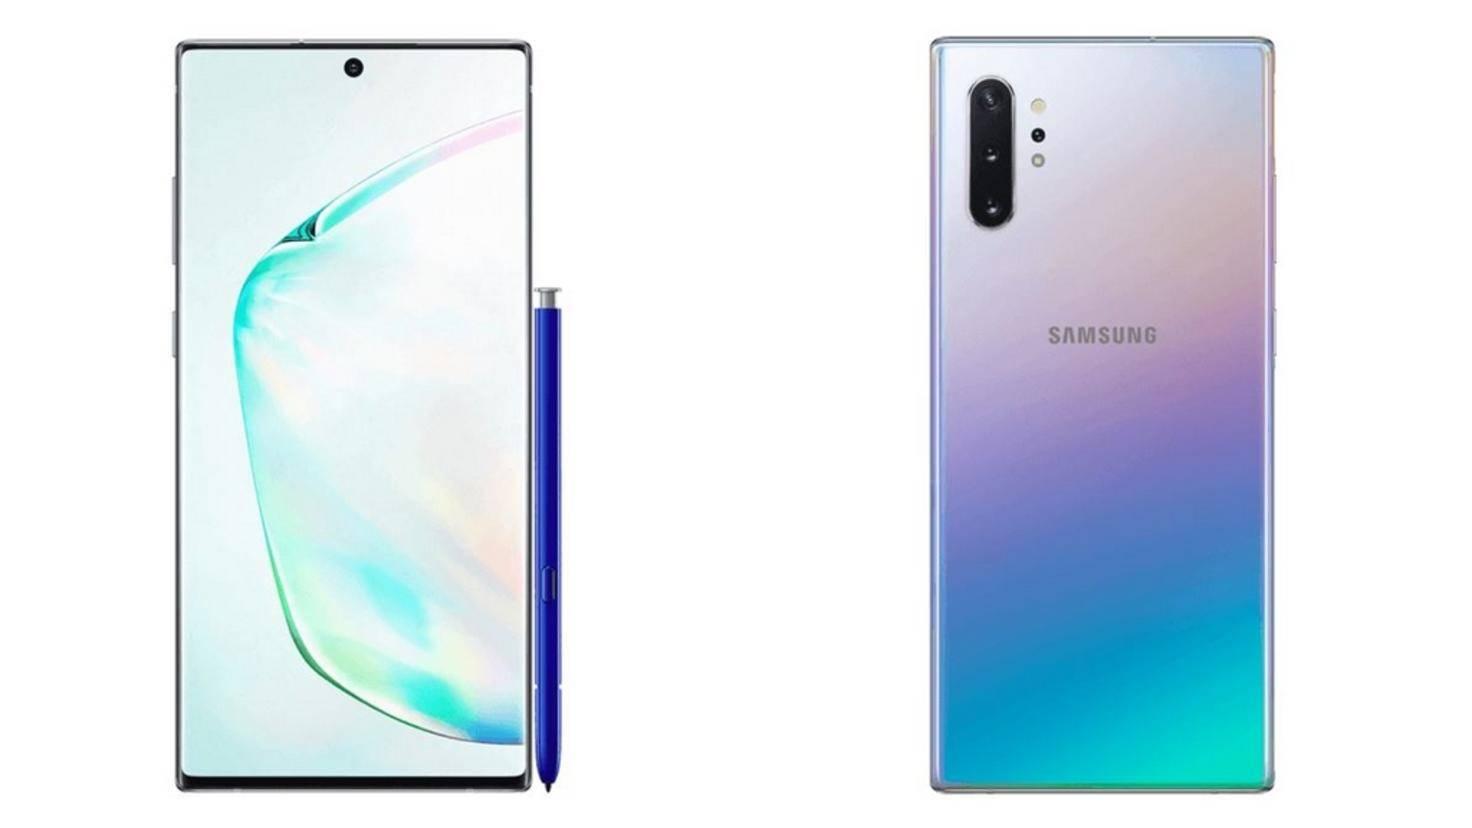 Samsung-Galaxy-Note-10-Plus-01